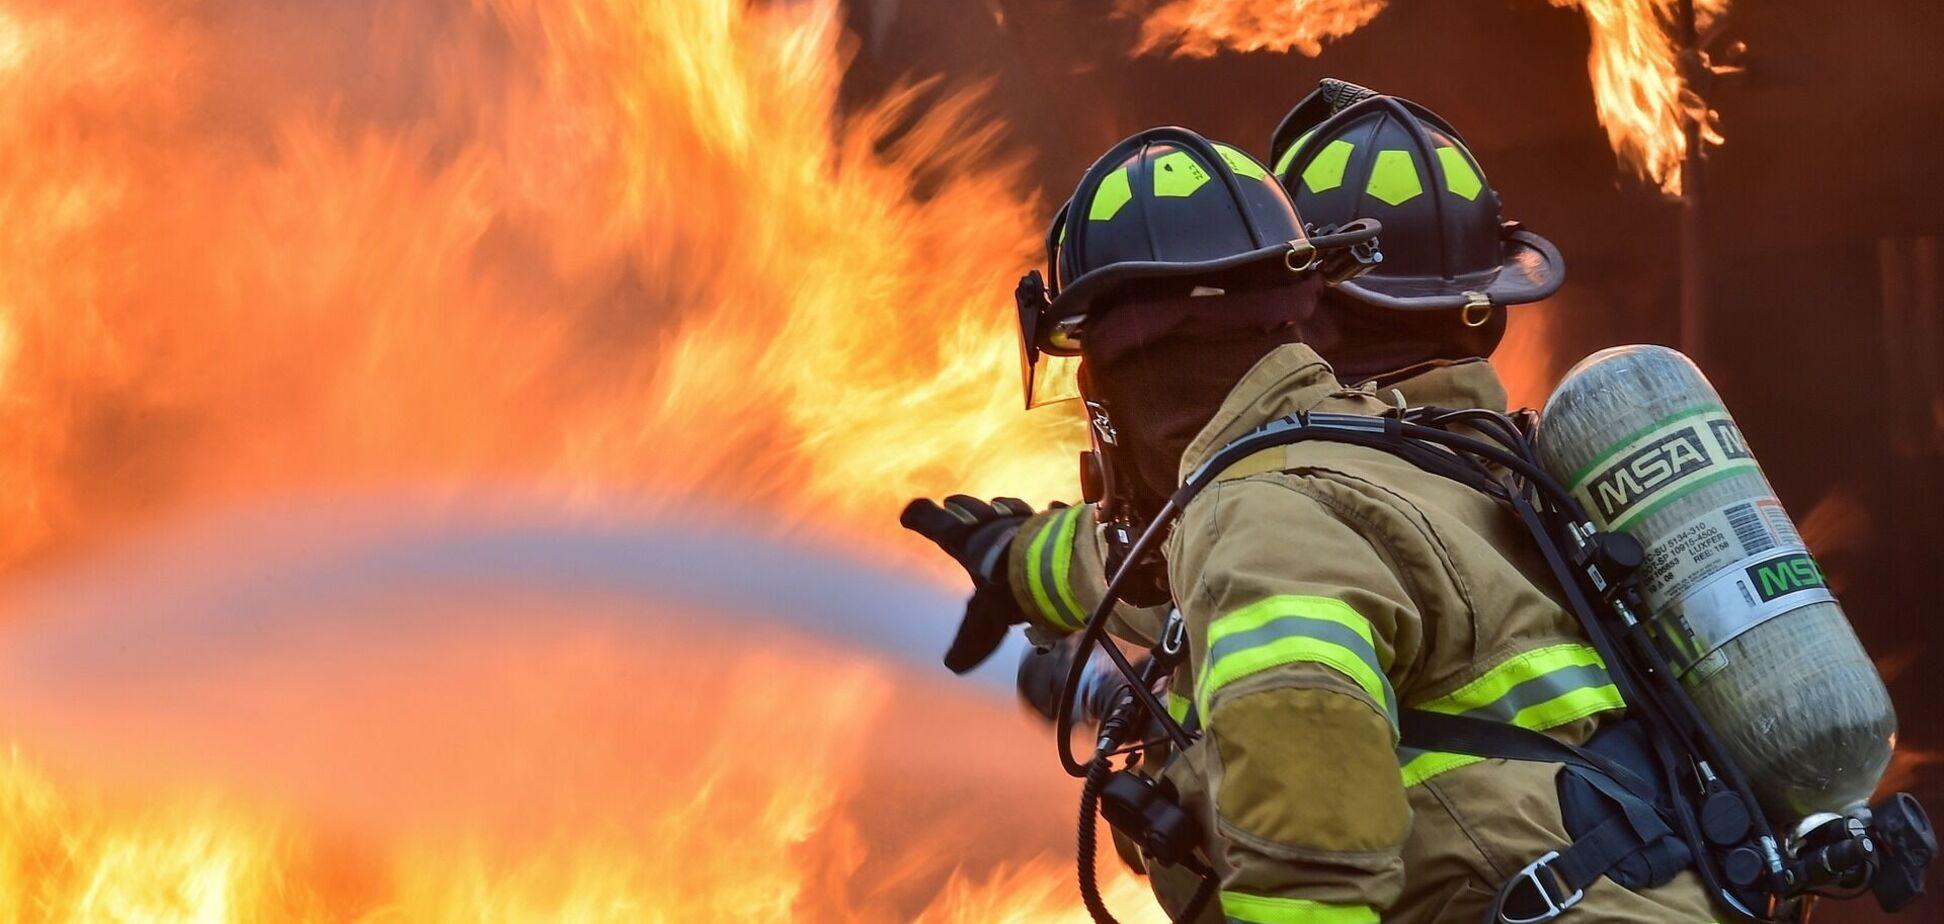 В Кривом Роге при пожаре погиб молодой мужчина. Фото